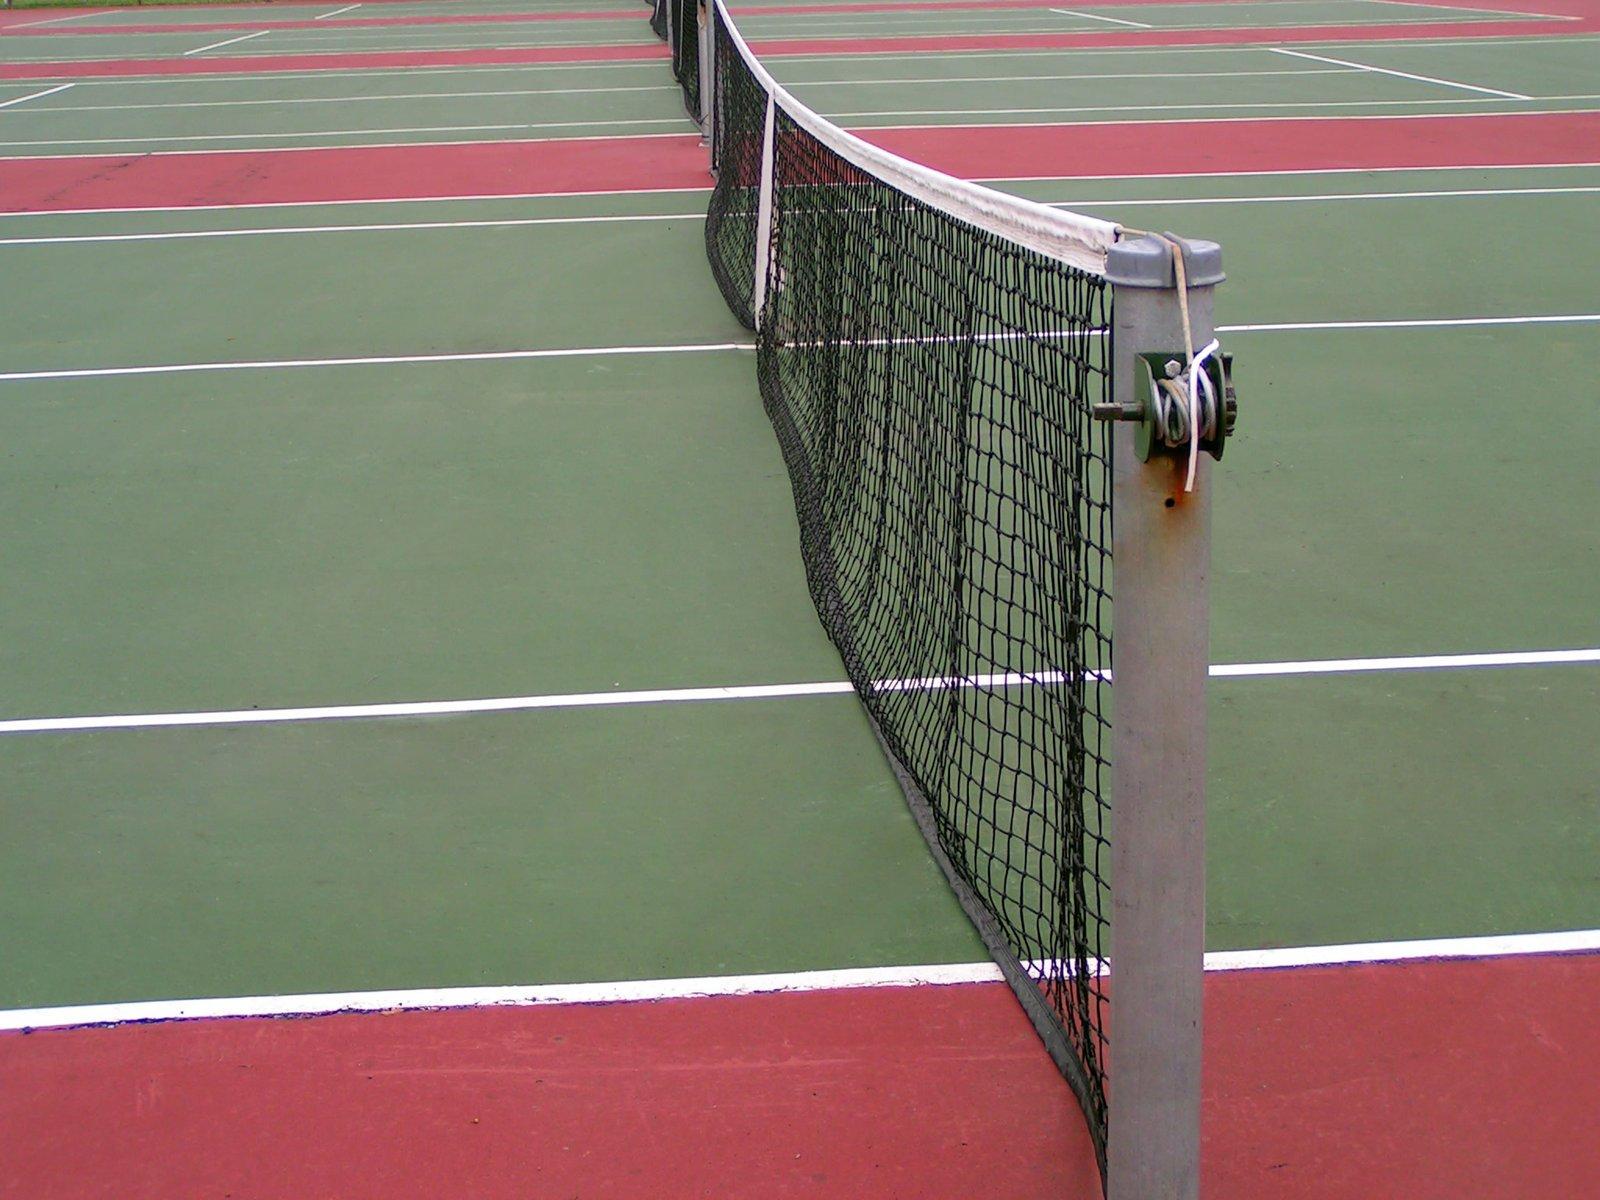 Free Ancien terrain de tennis 2 Stock Photo - FreeImages.com